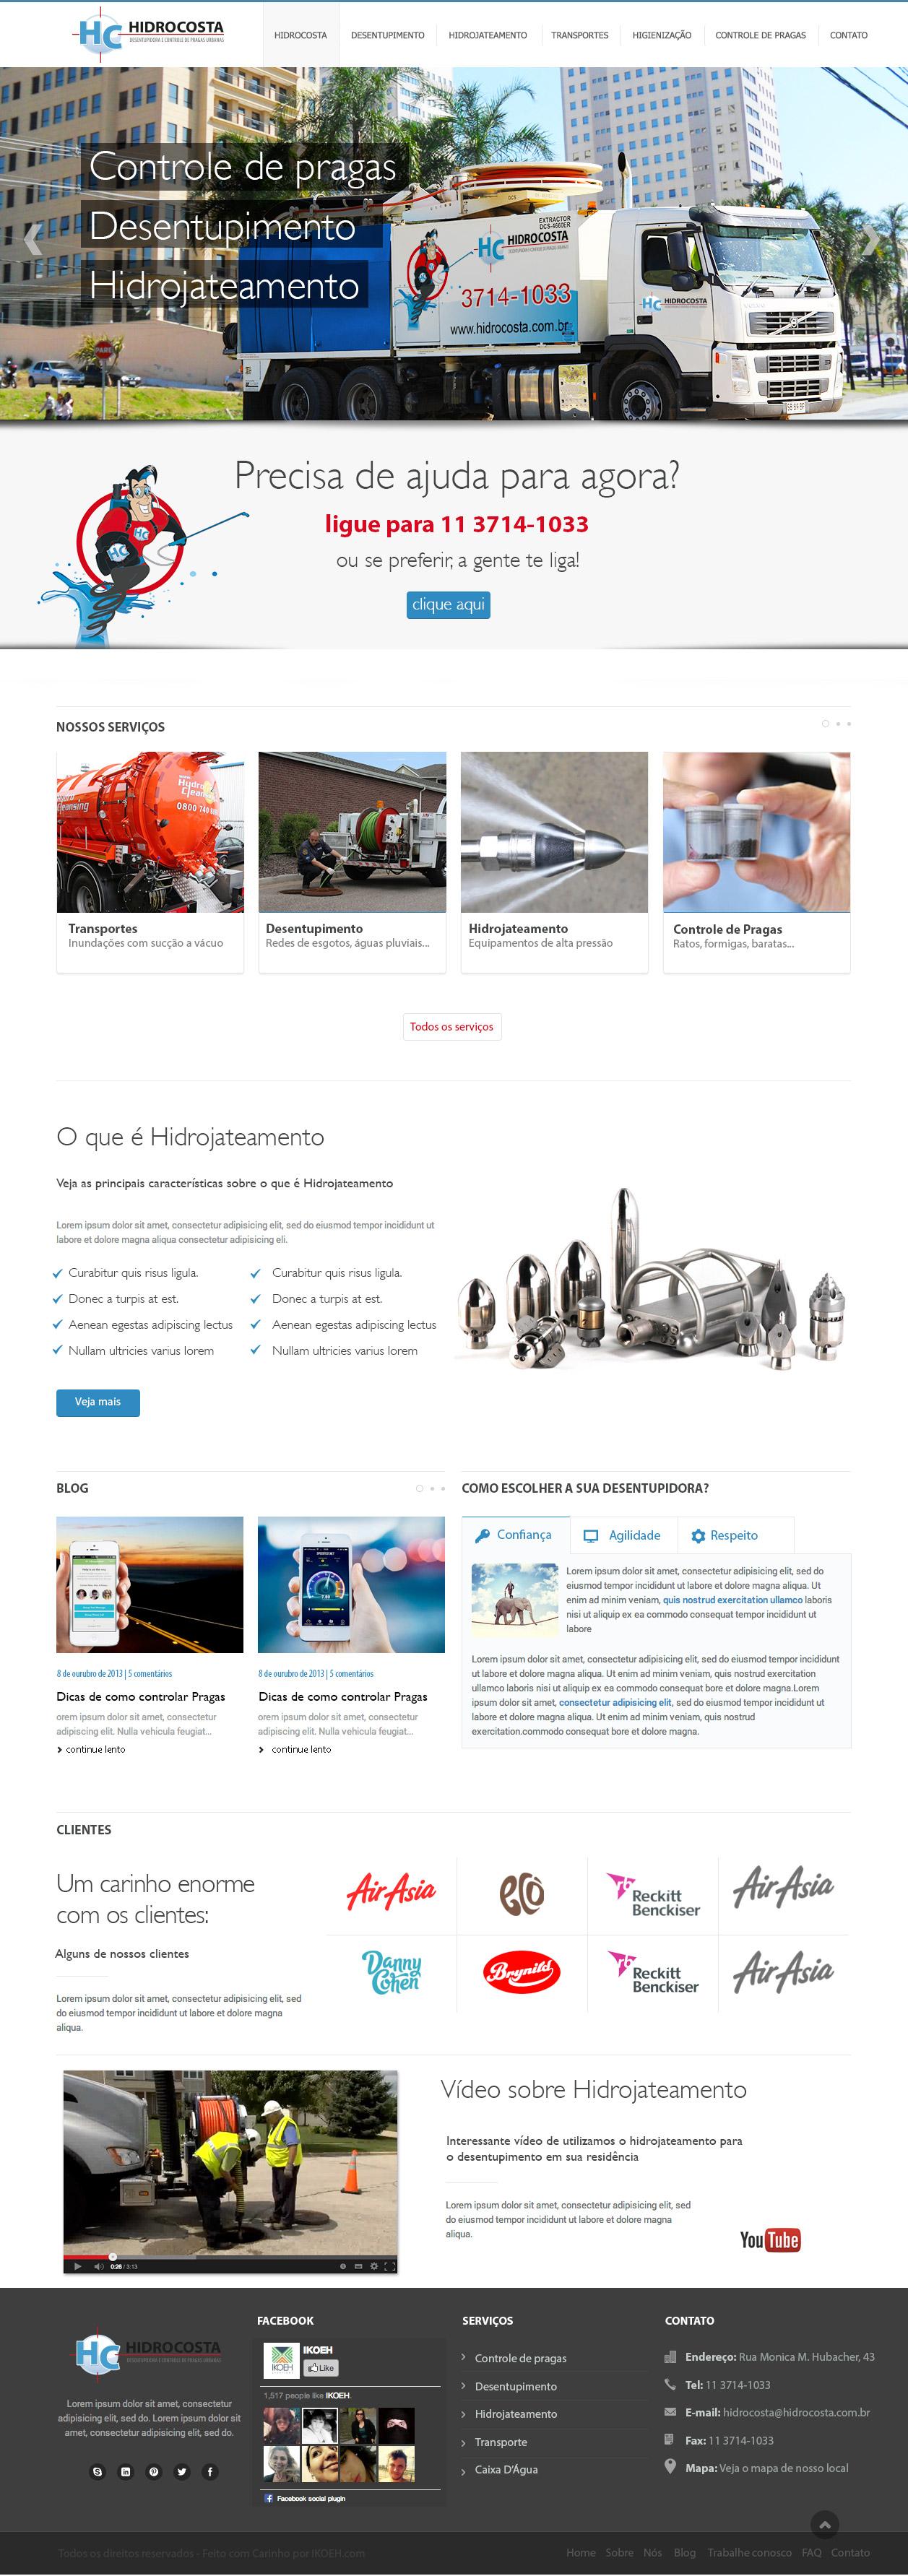 site-hidrocosta-01